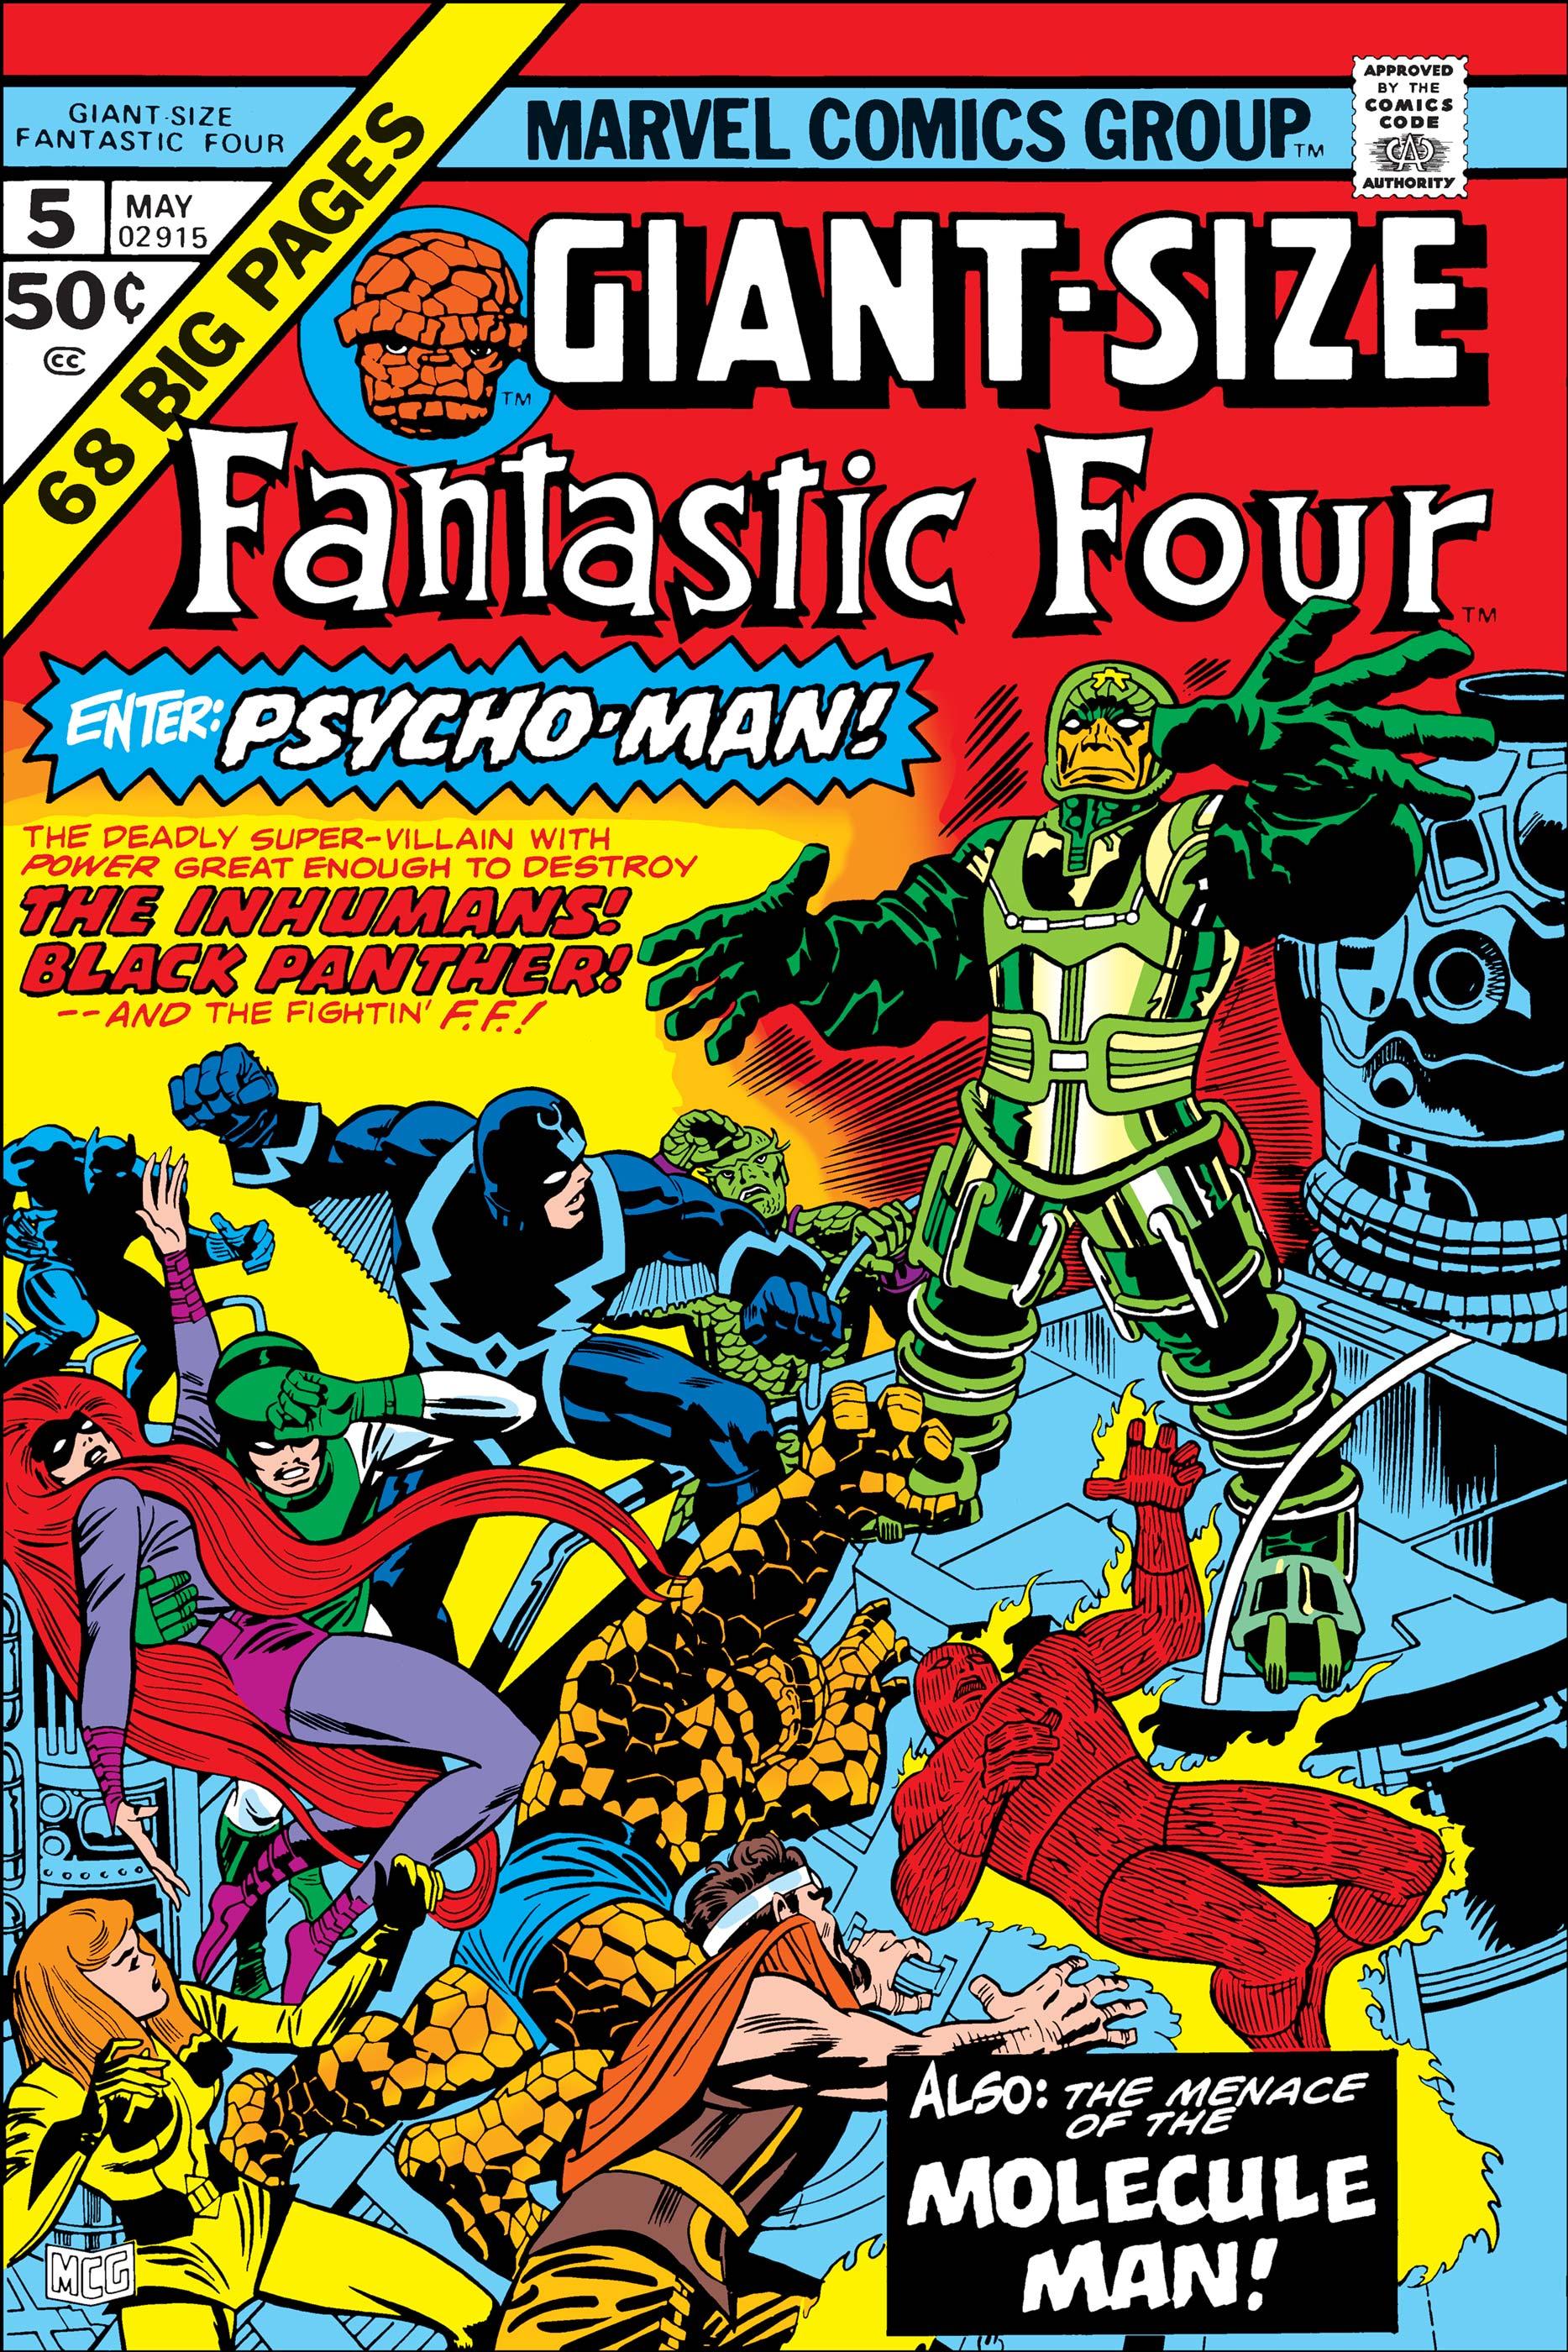 Giant-Size Fantastic Four (1974) #5